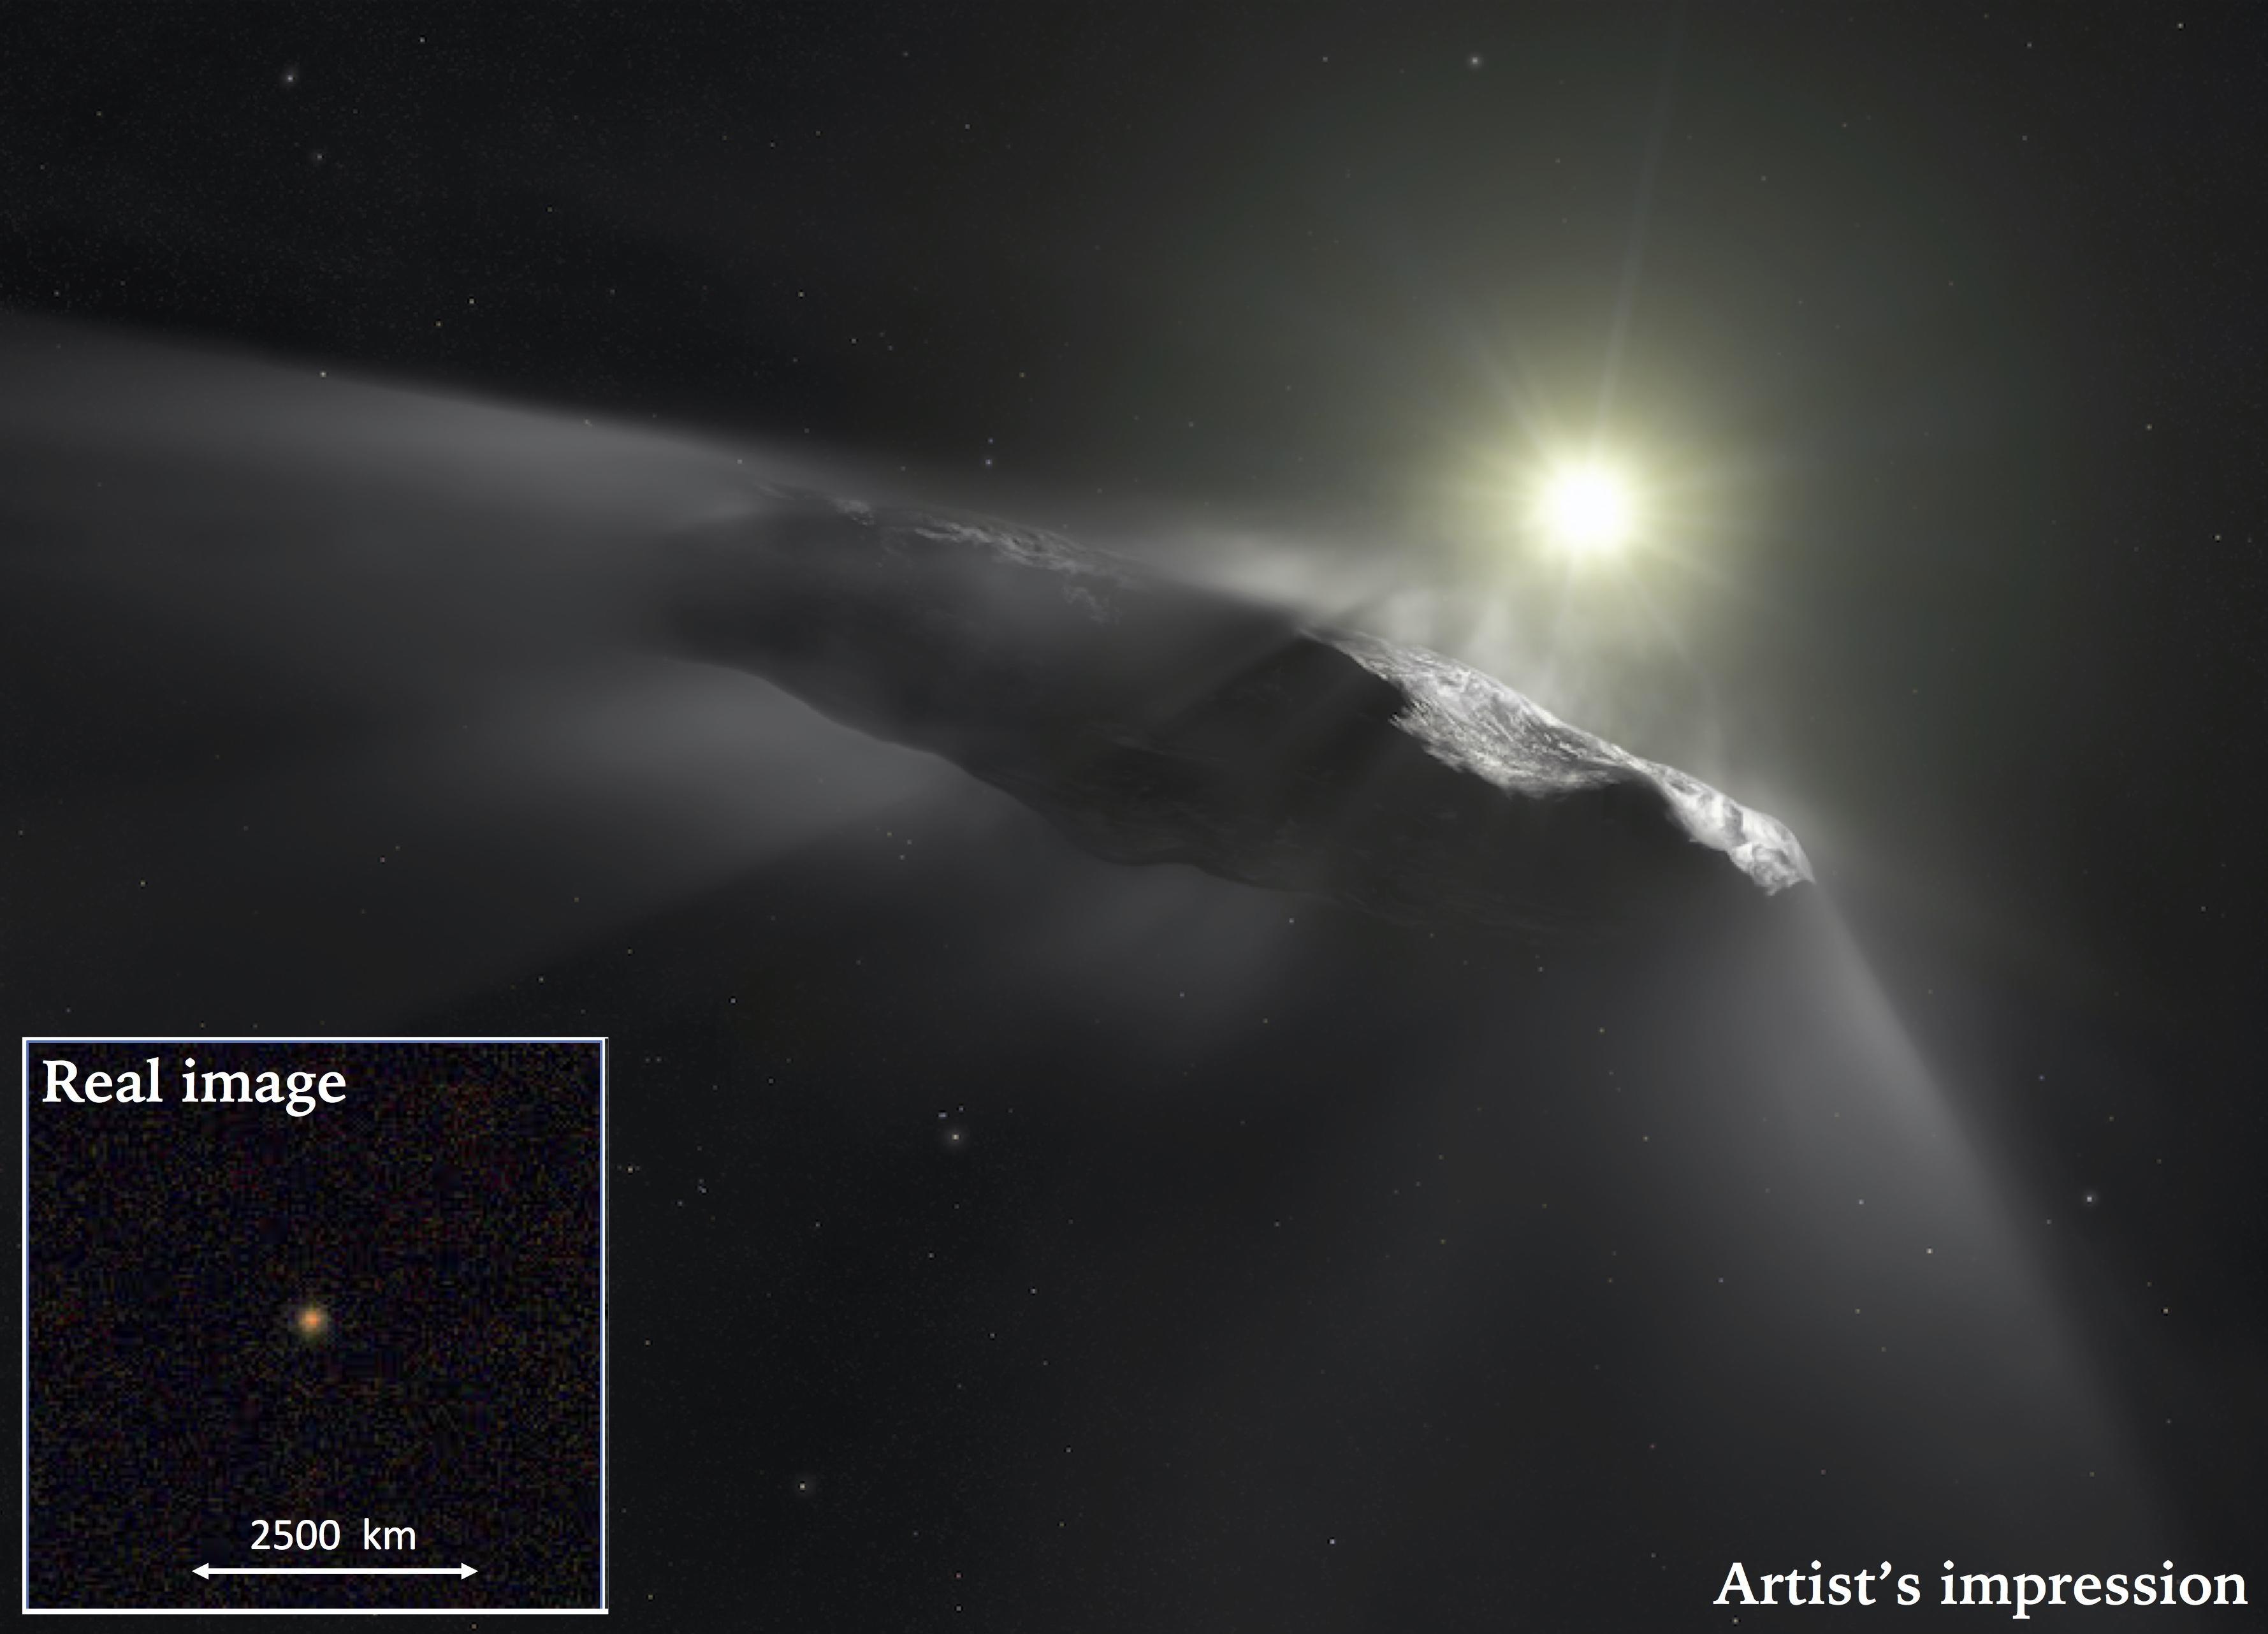 Oumuamua Artist's Impression and Actual Image